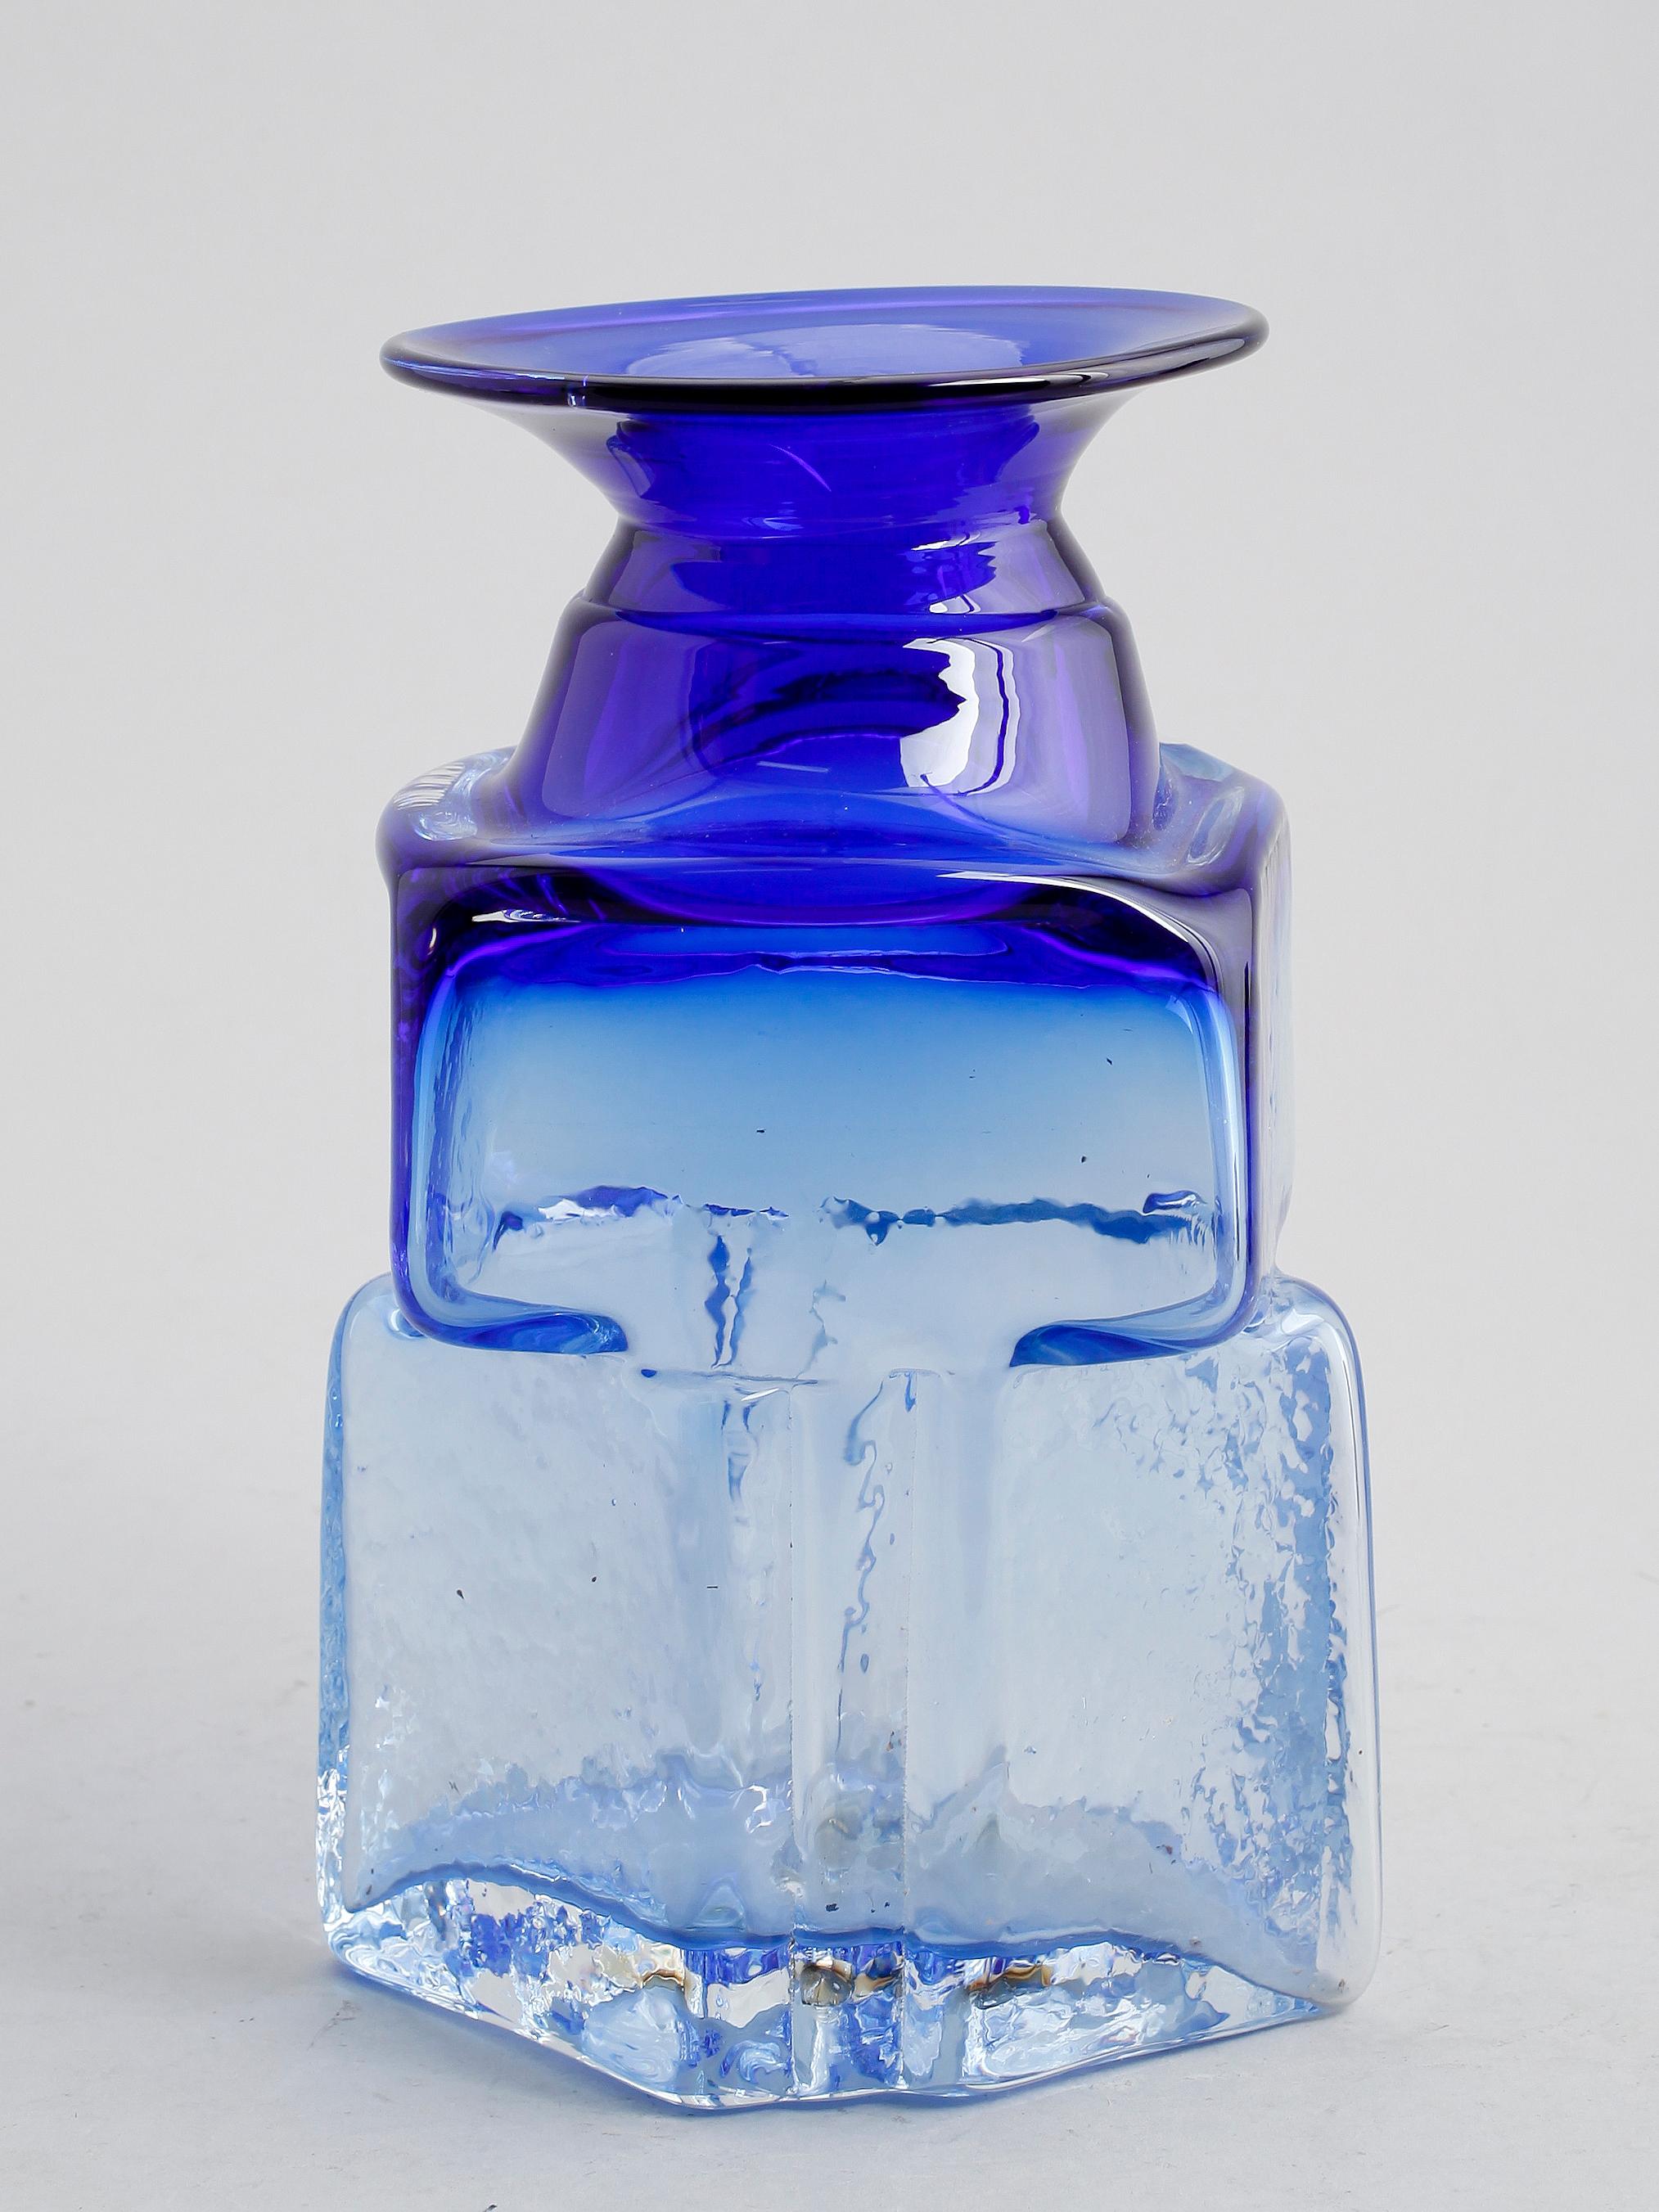 Glasblasningen i lindshammar laggs ner